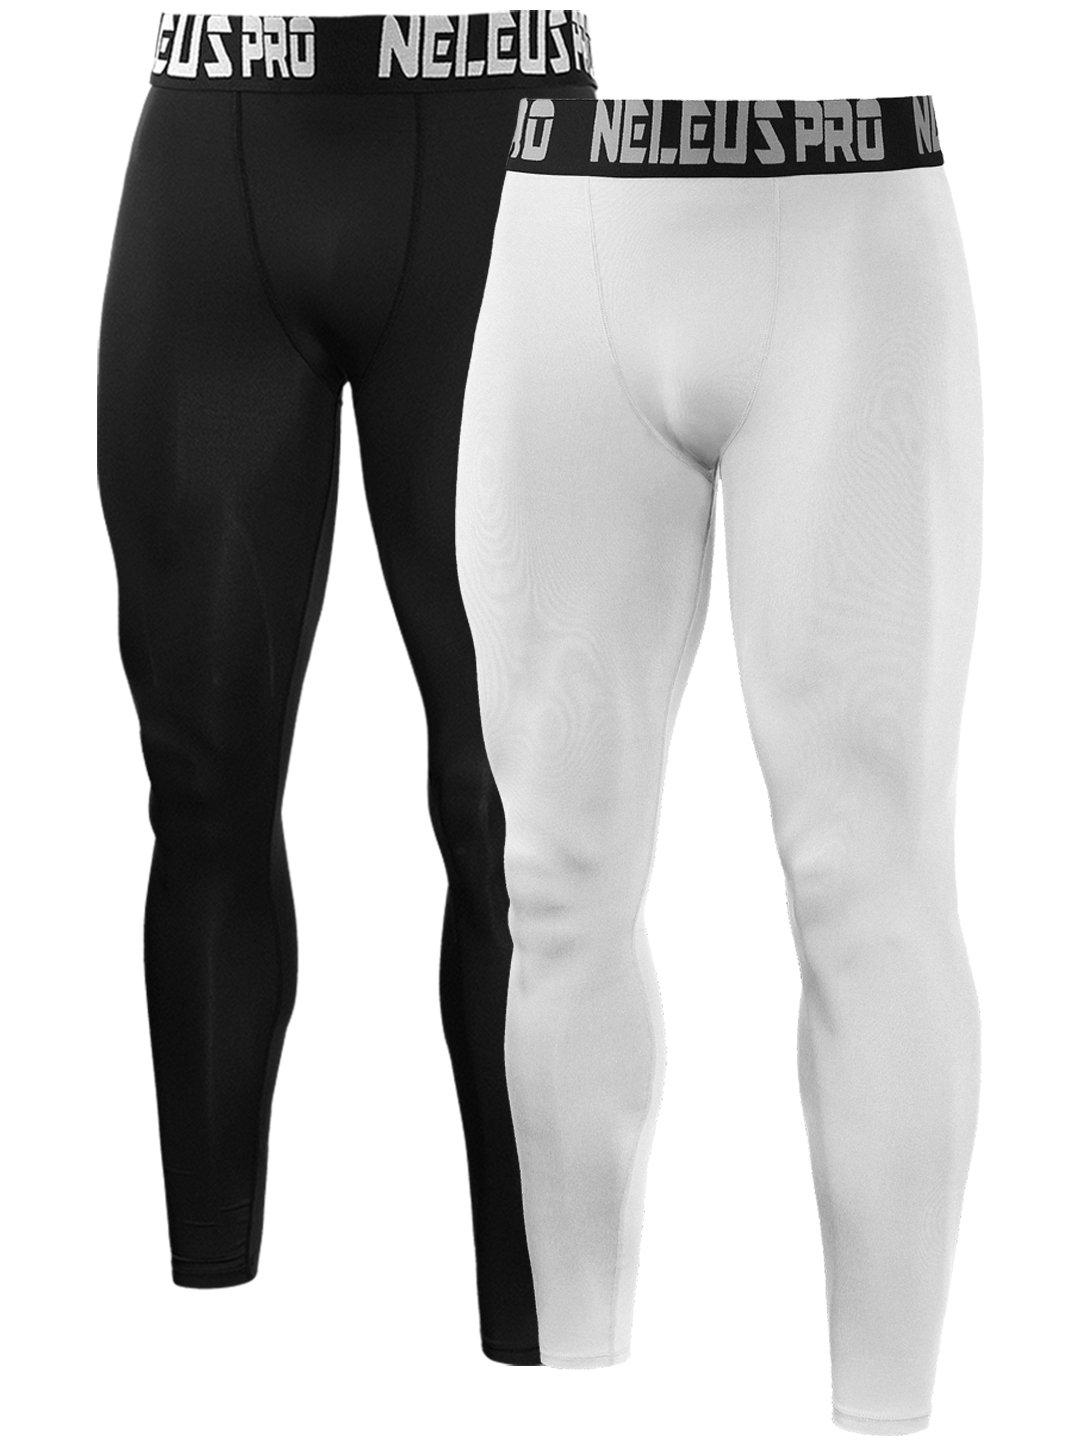 Neleus Men's 2 Pack Compression Tights Sport Running Leggings Pants,6019,Black,White,US S,EU M